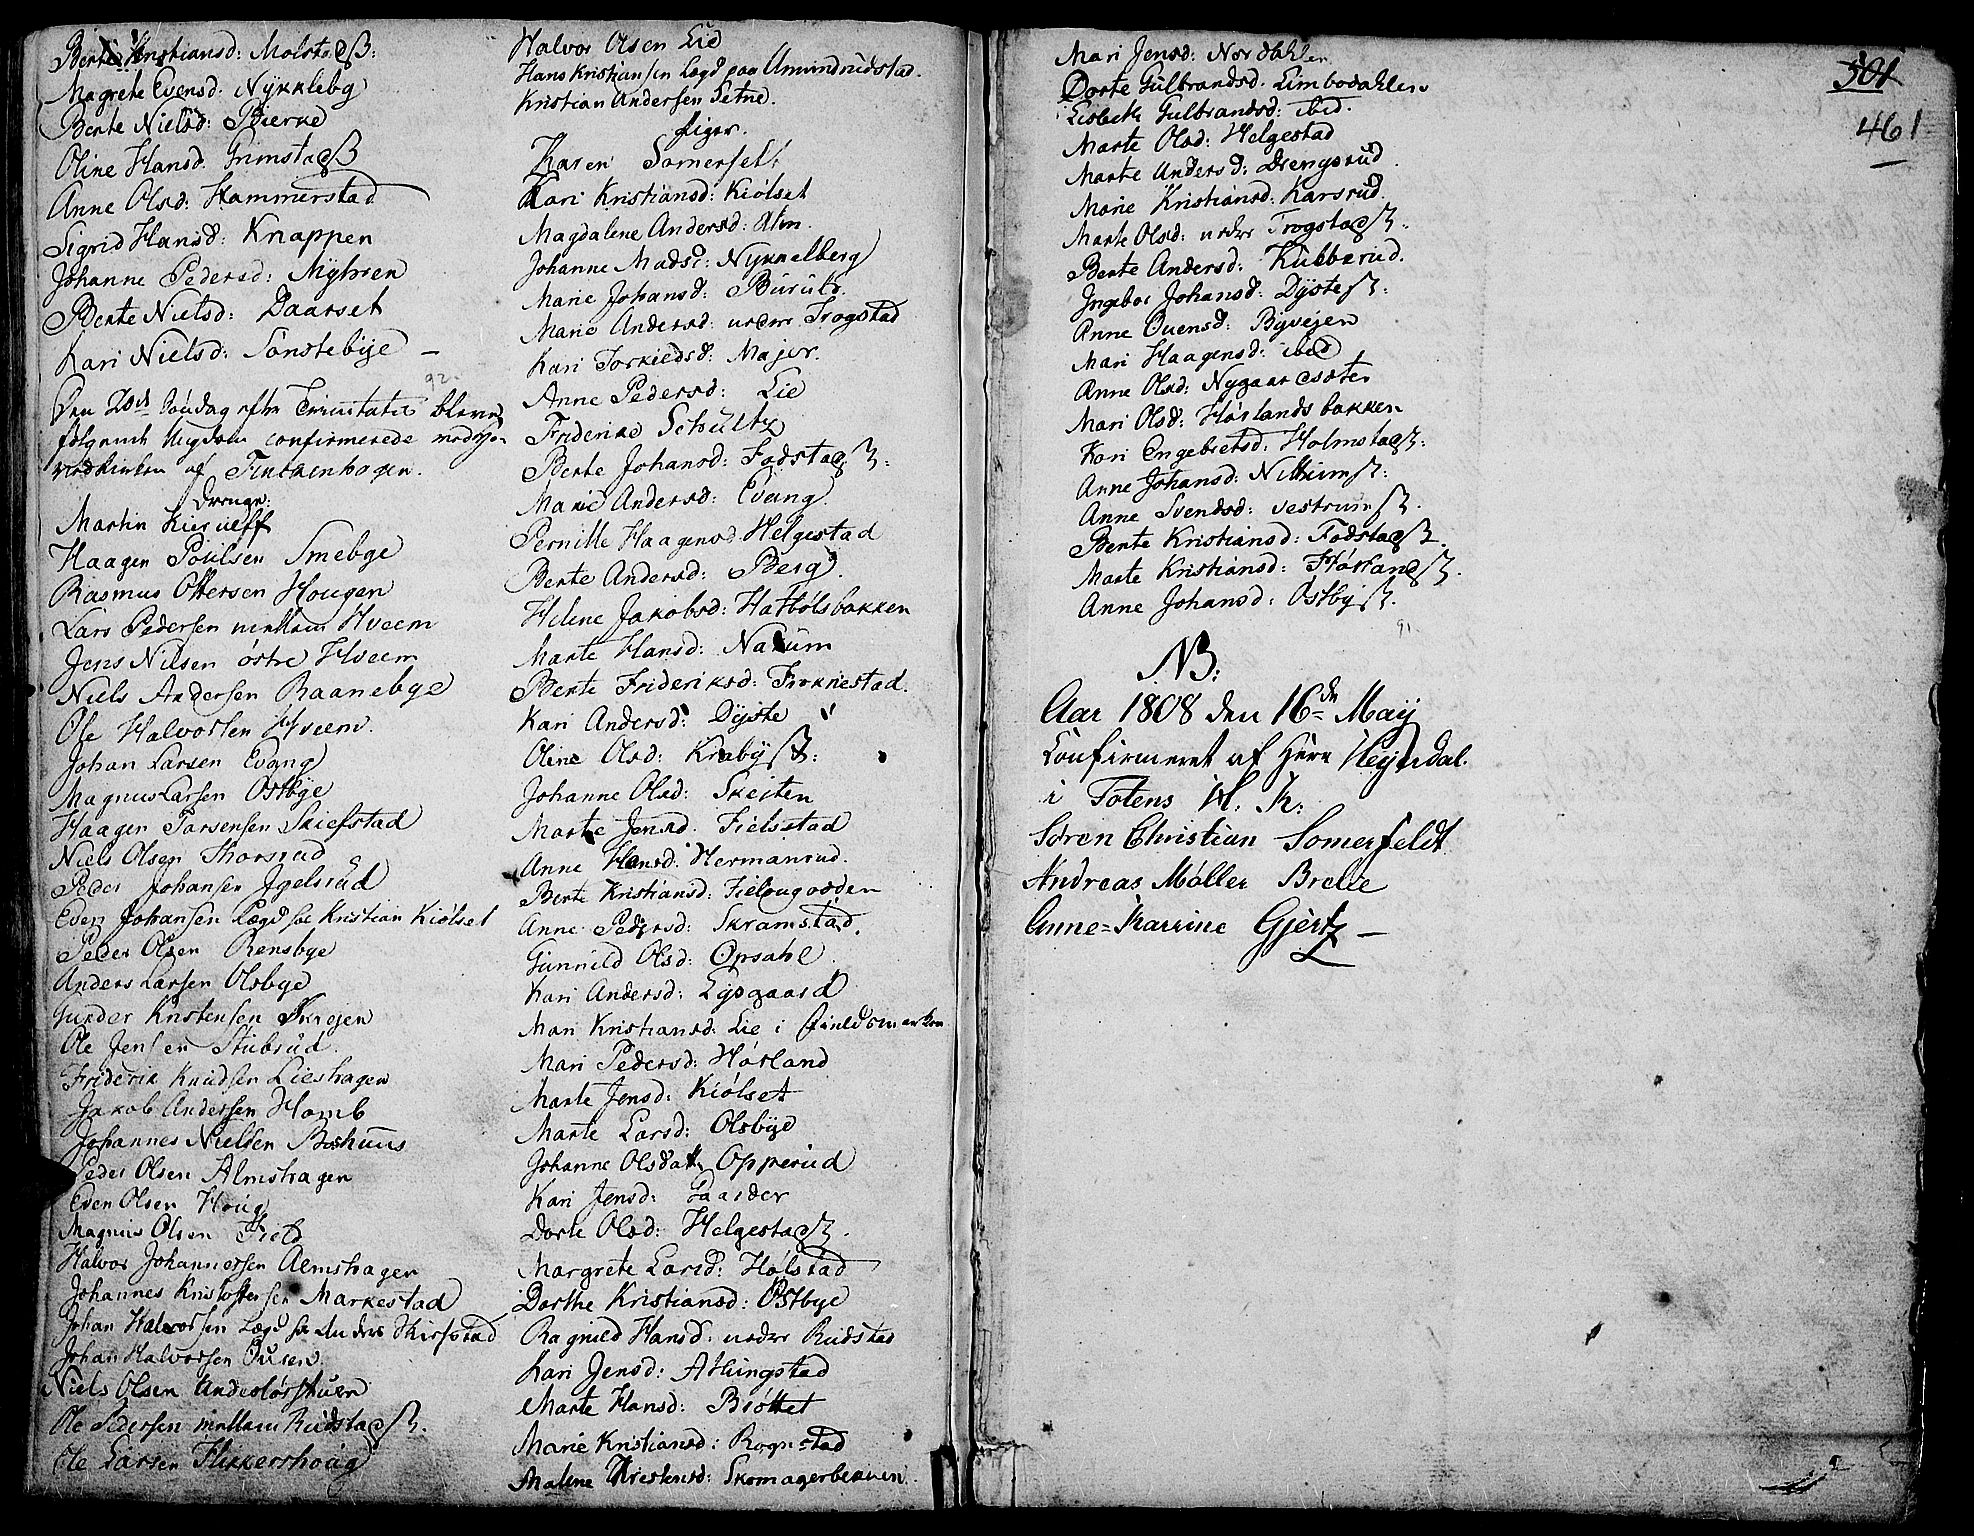 SAH, Toten prestekontor, Ministerialbok nr. 7, 1794-1809, s. 461